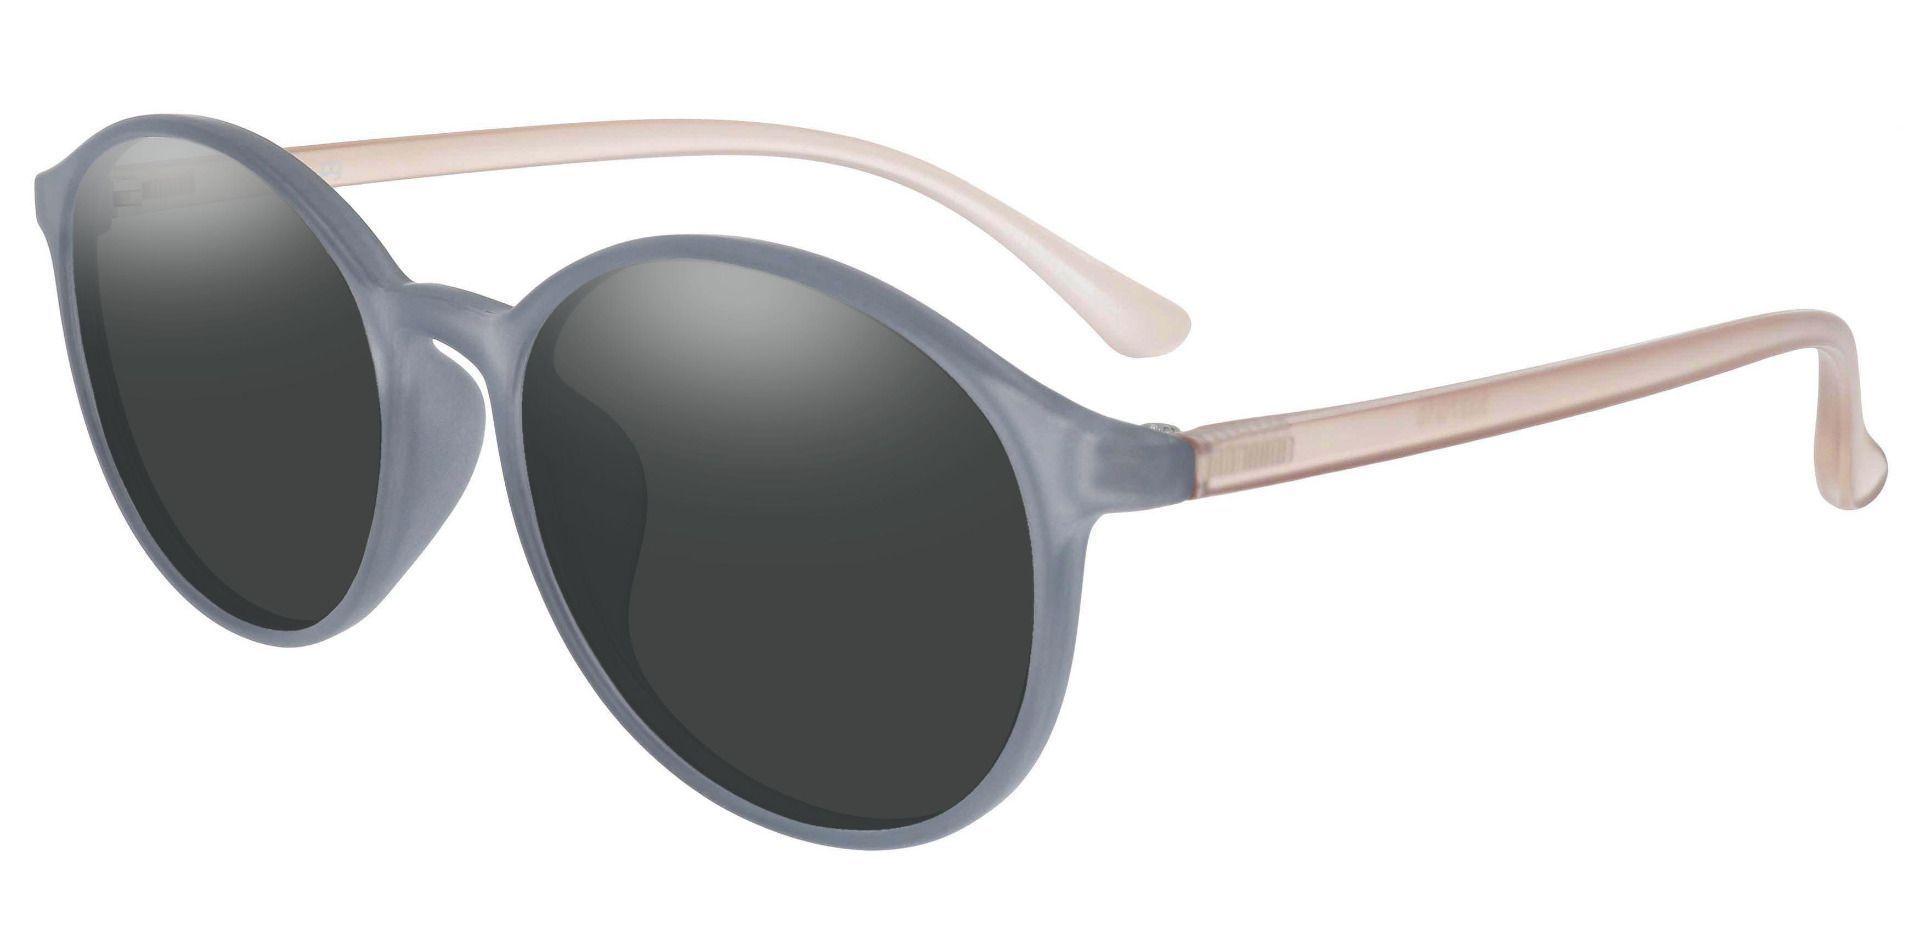 Zemi Round Prescription Sunglasses - Gray Frame With Gray Lenses